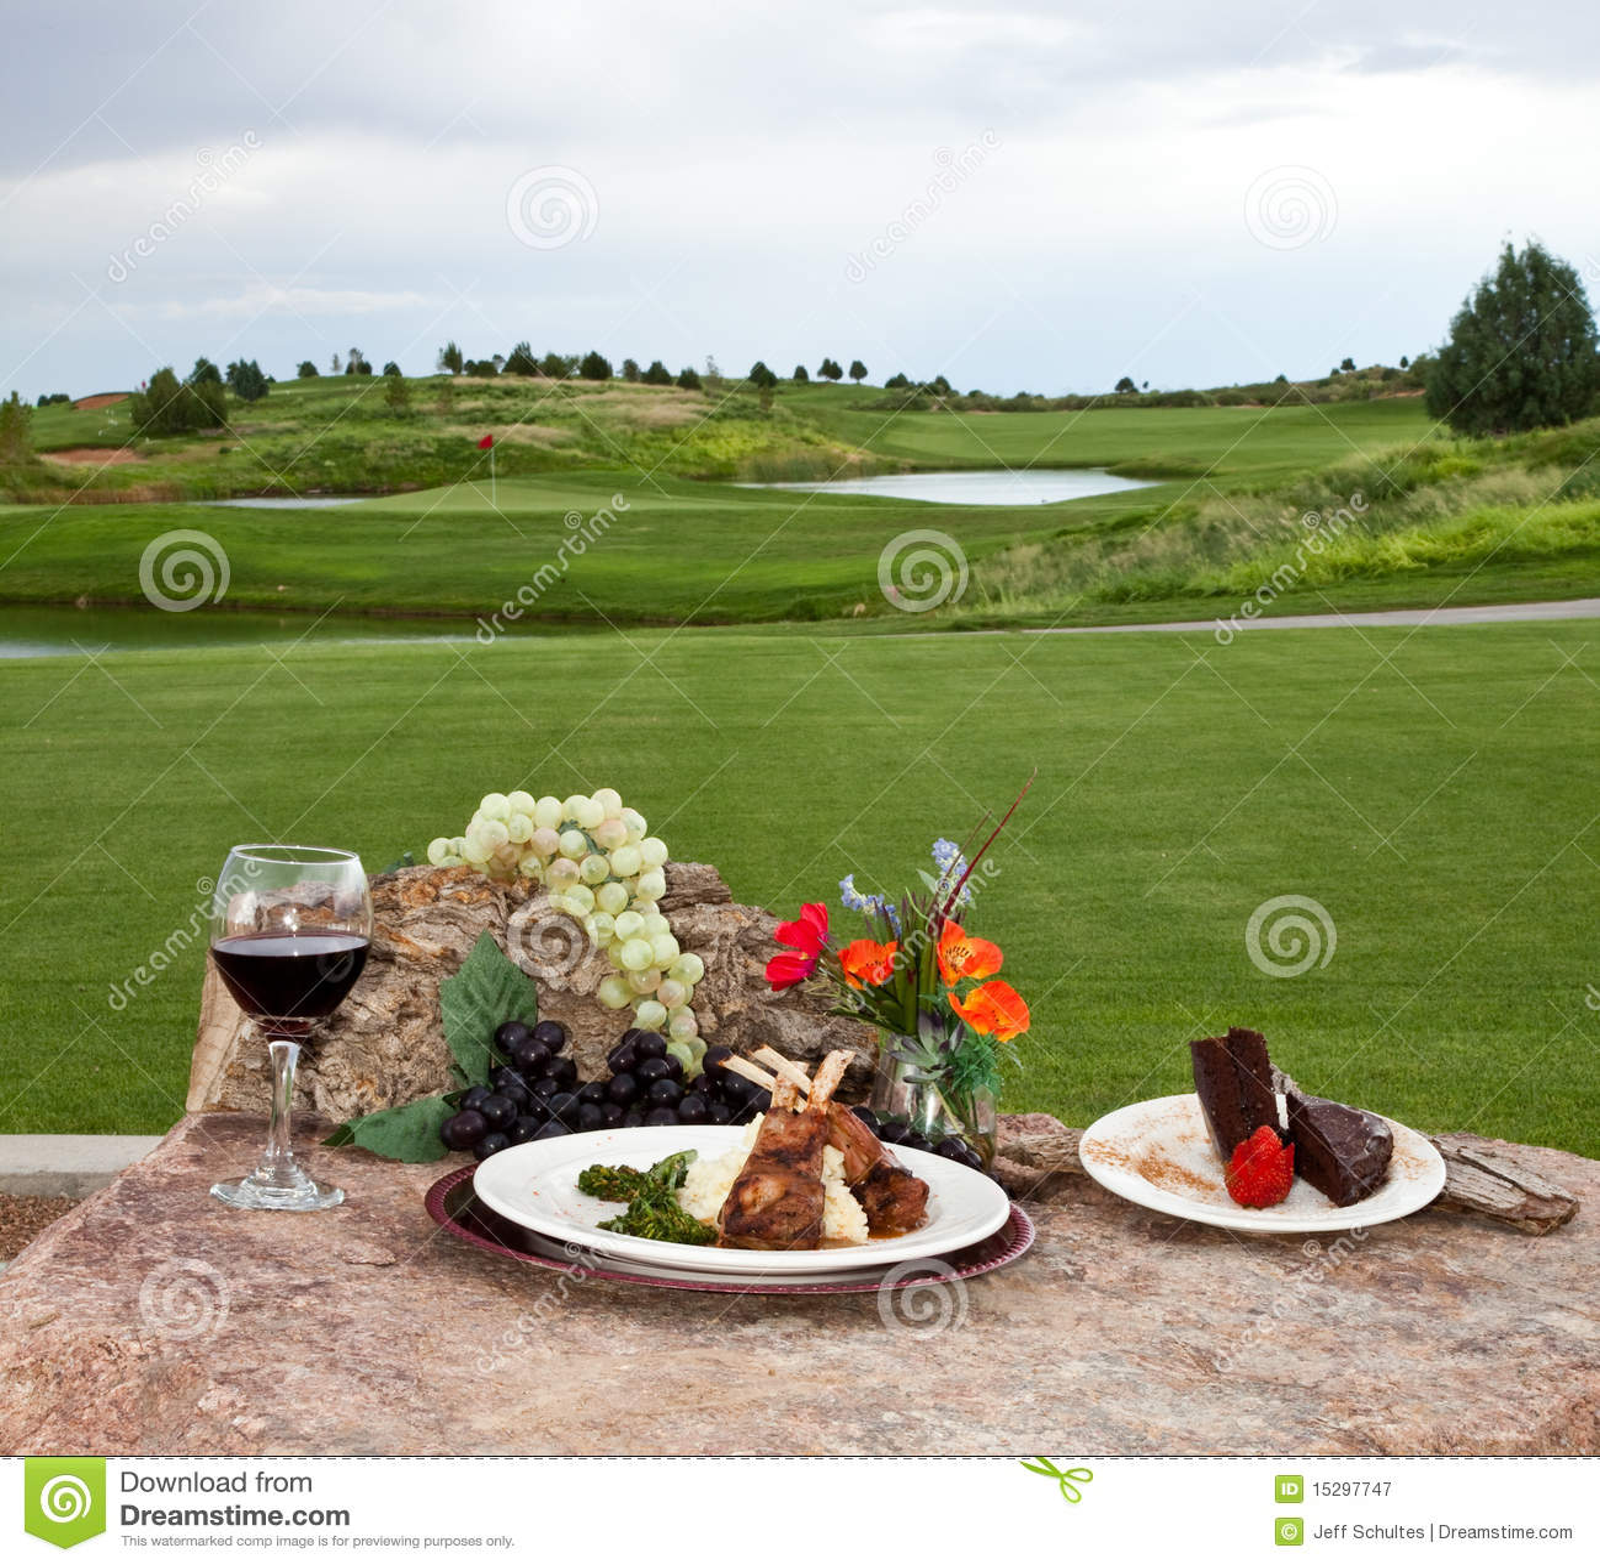 Dîner au terrain de golf